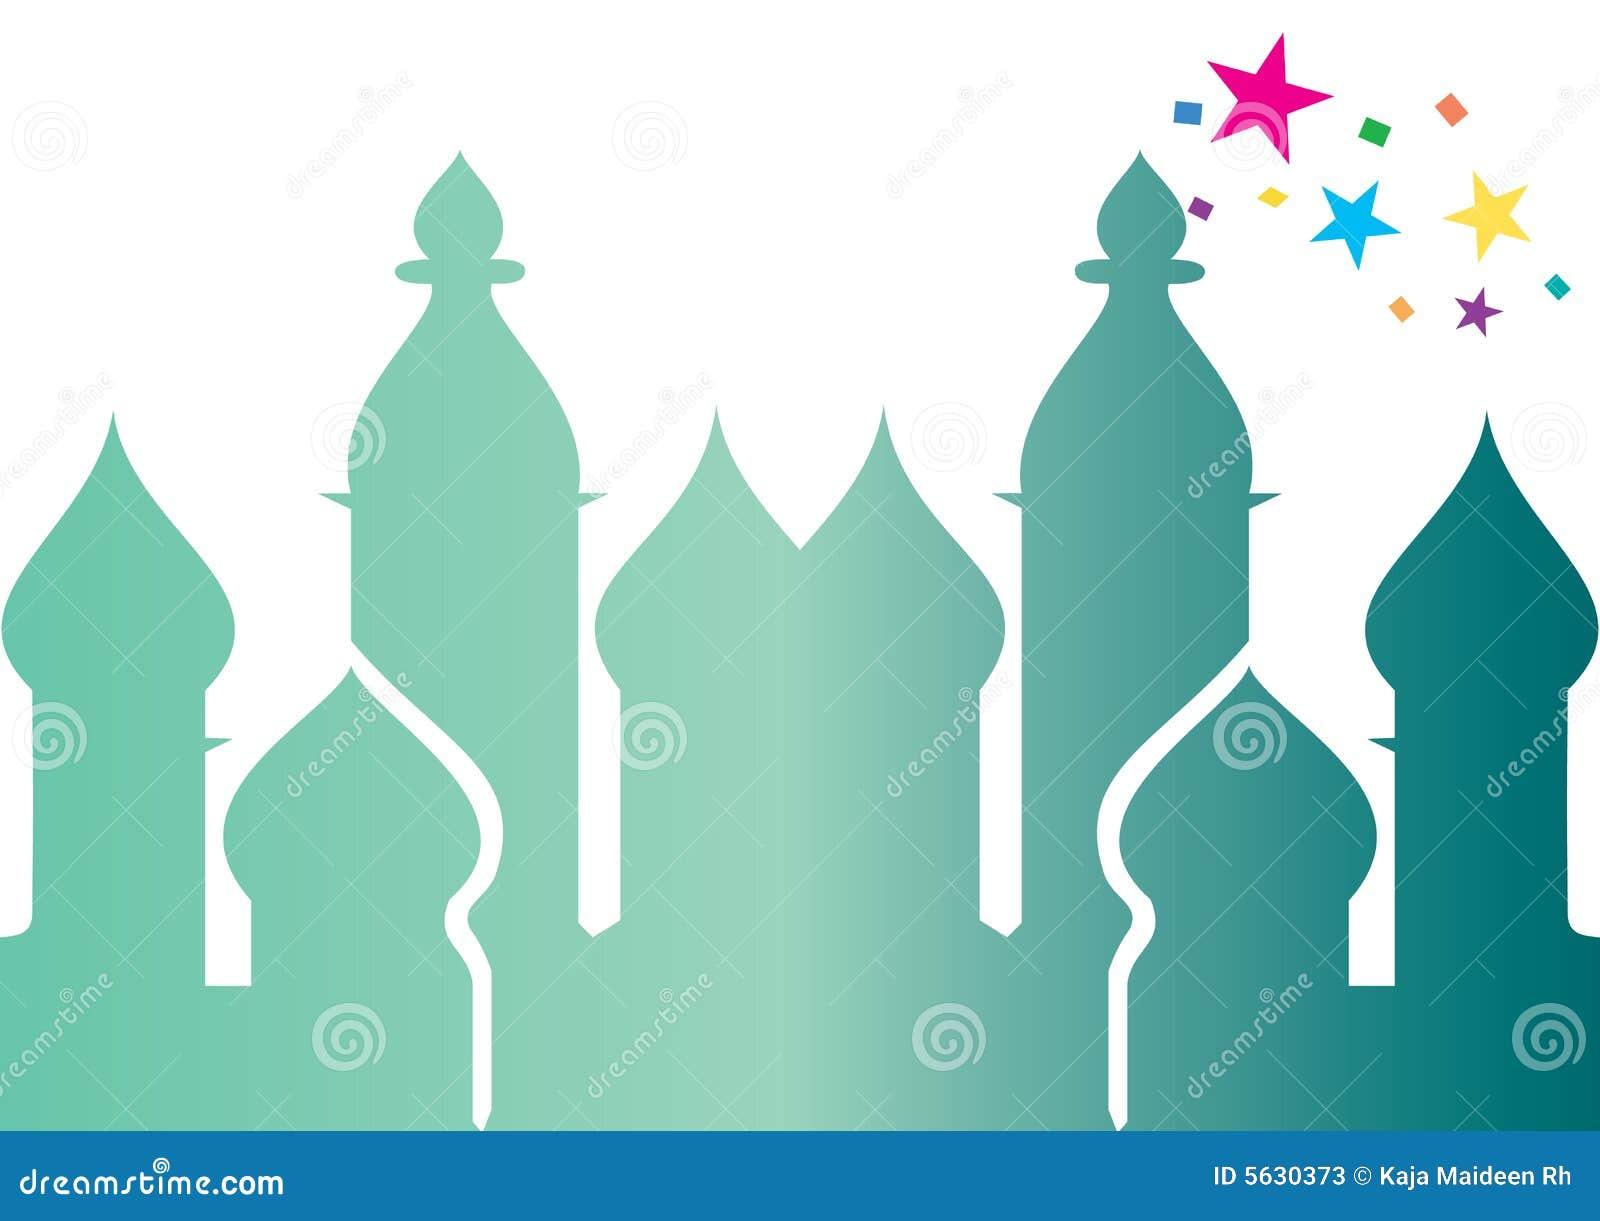 Mosque - vector